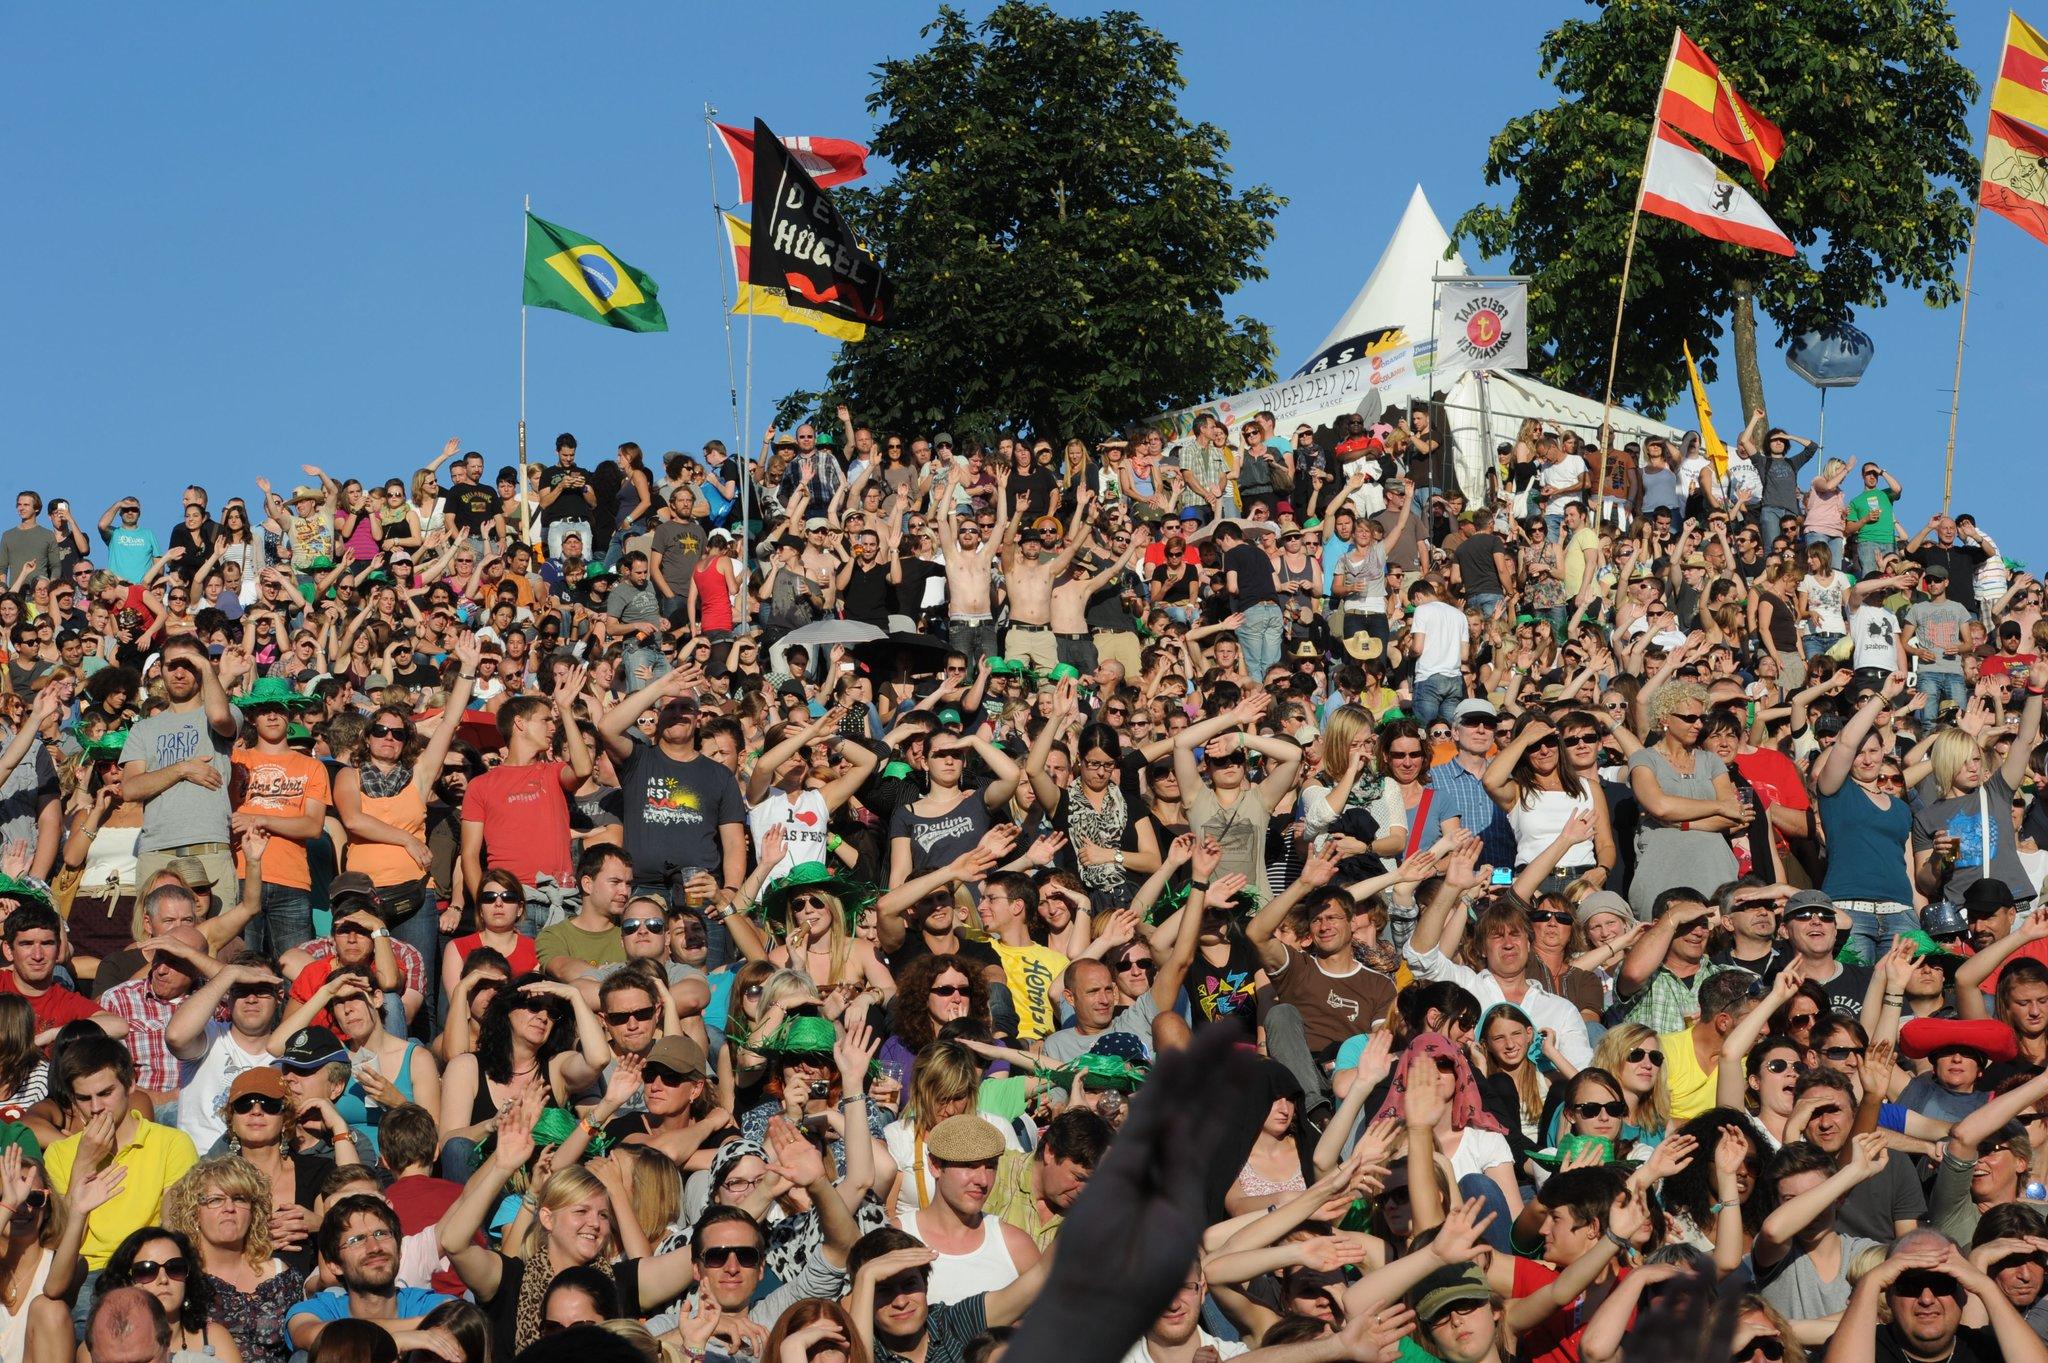 Das Fest Karlsruhe Line Up